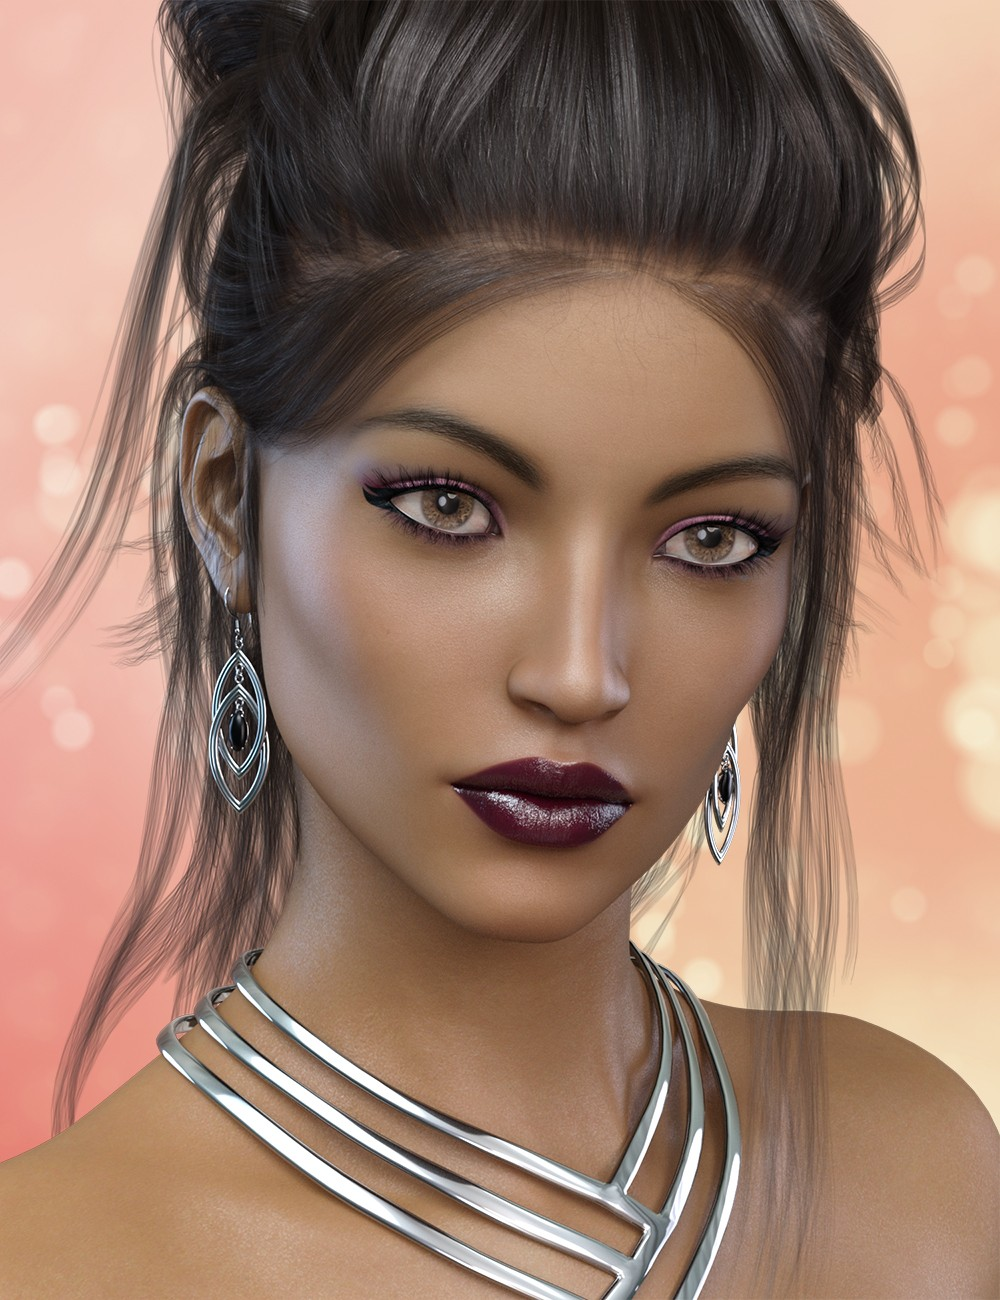 Download DAZ Studio 3 for FREE!: DAZ 3D - Selina Bundle